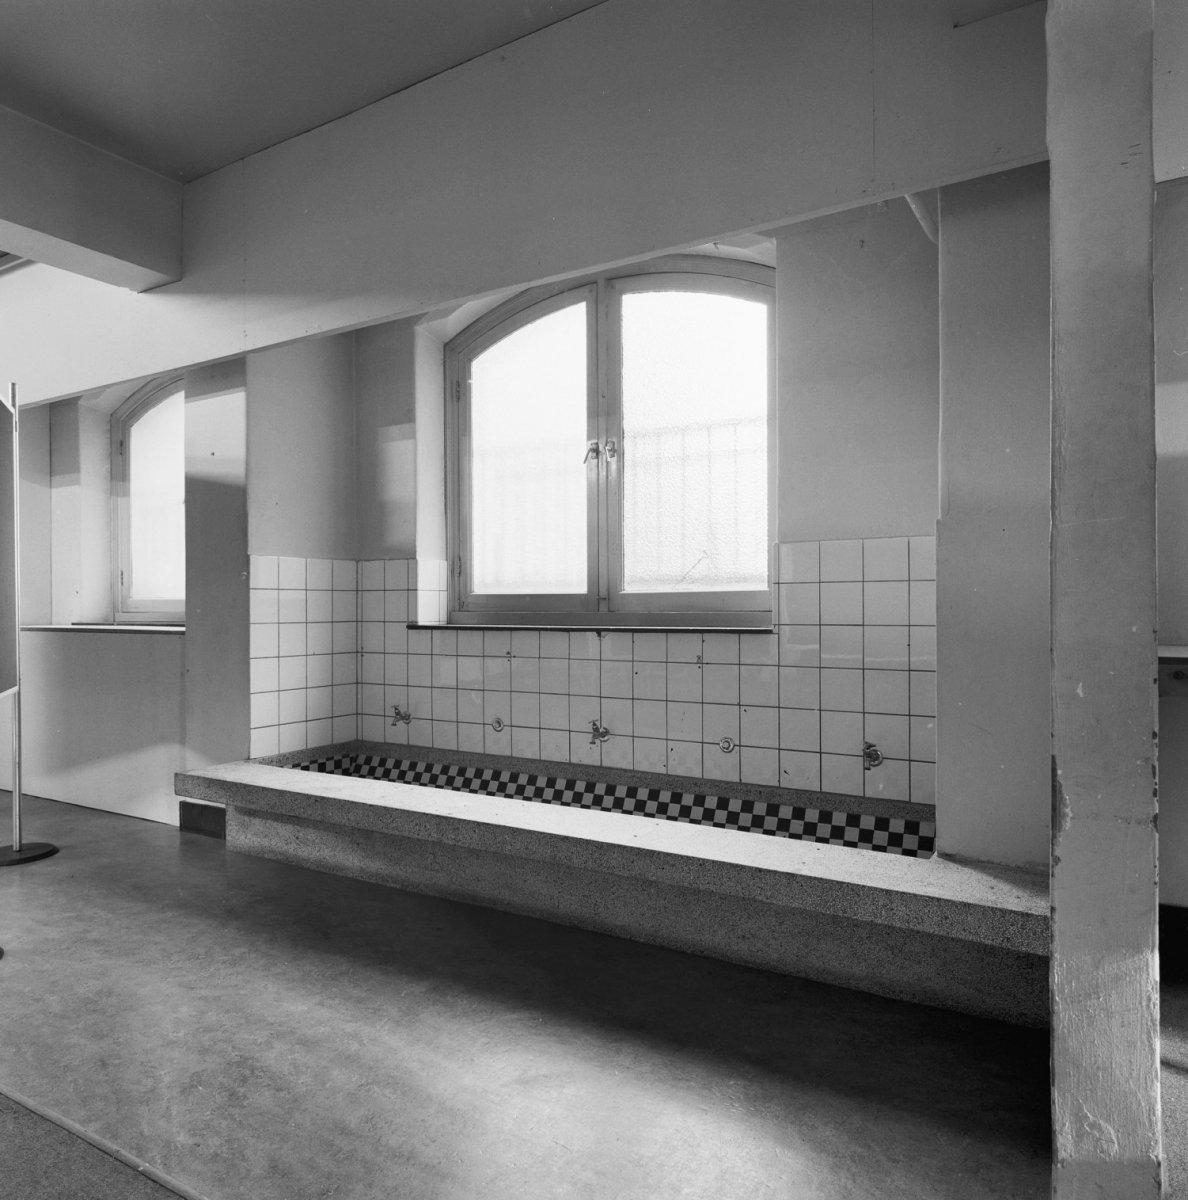 Description Interieur, granieten wasbak in badkamer  's Hertogenbosch